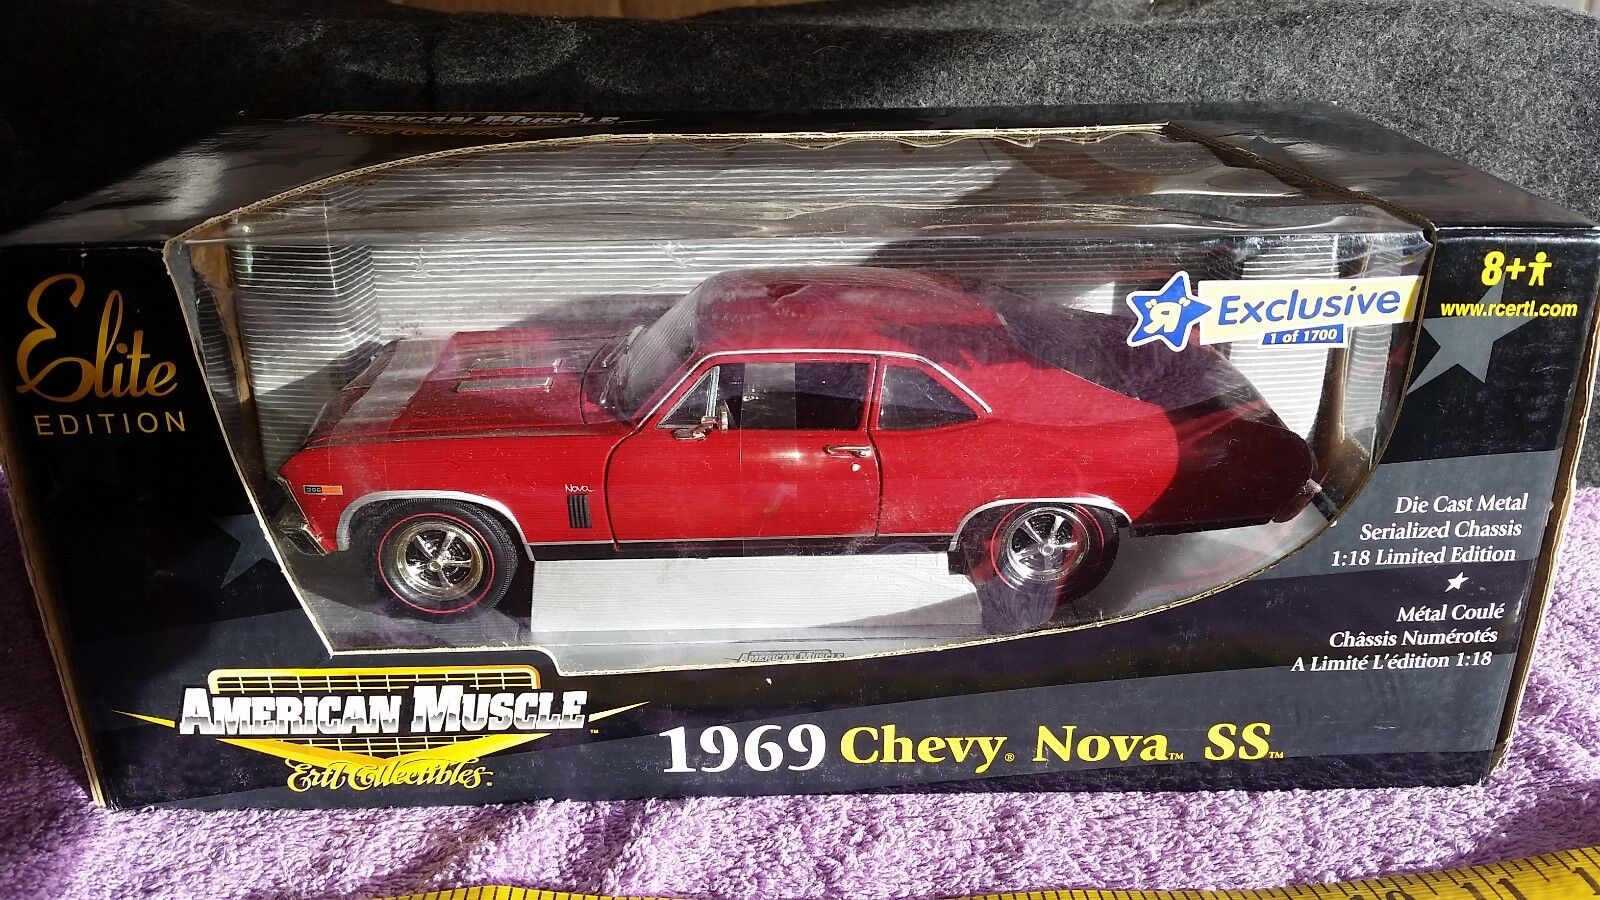 Ertl american muscle elite edition 1969 chevy nova ss  1 18th